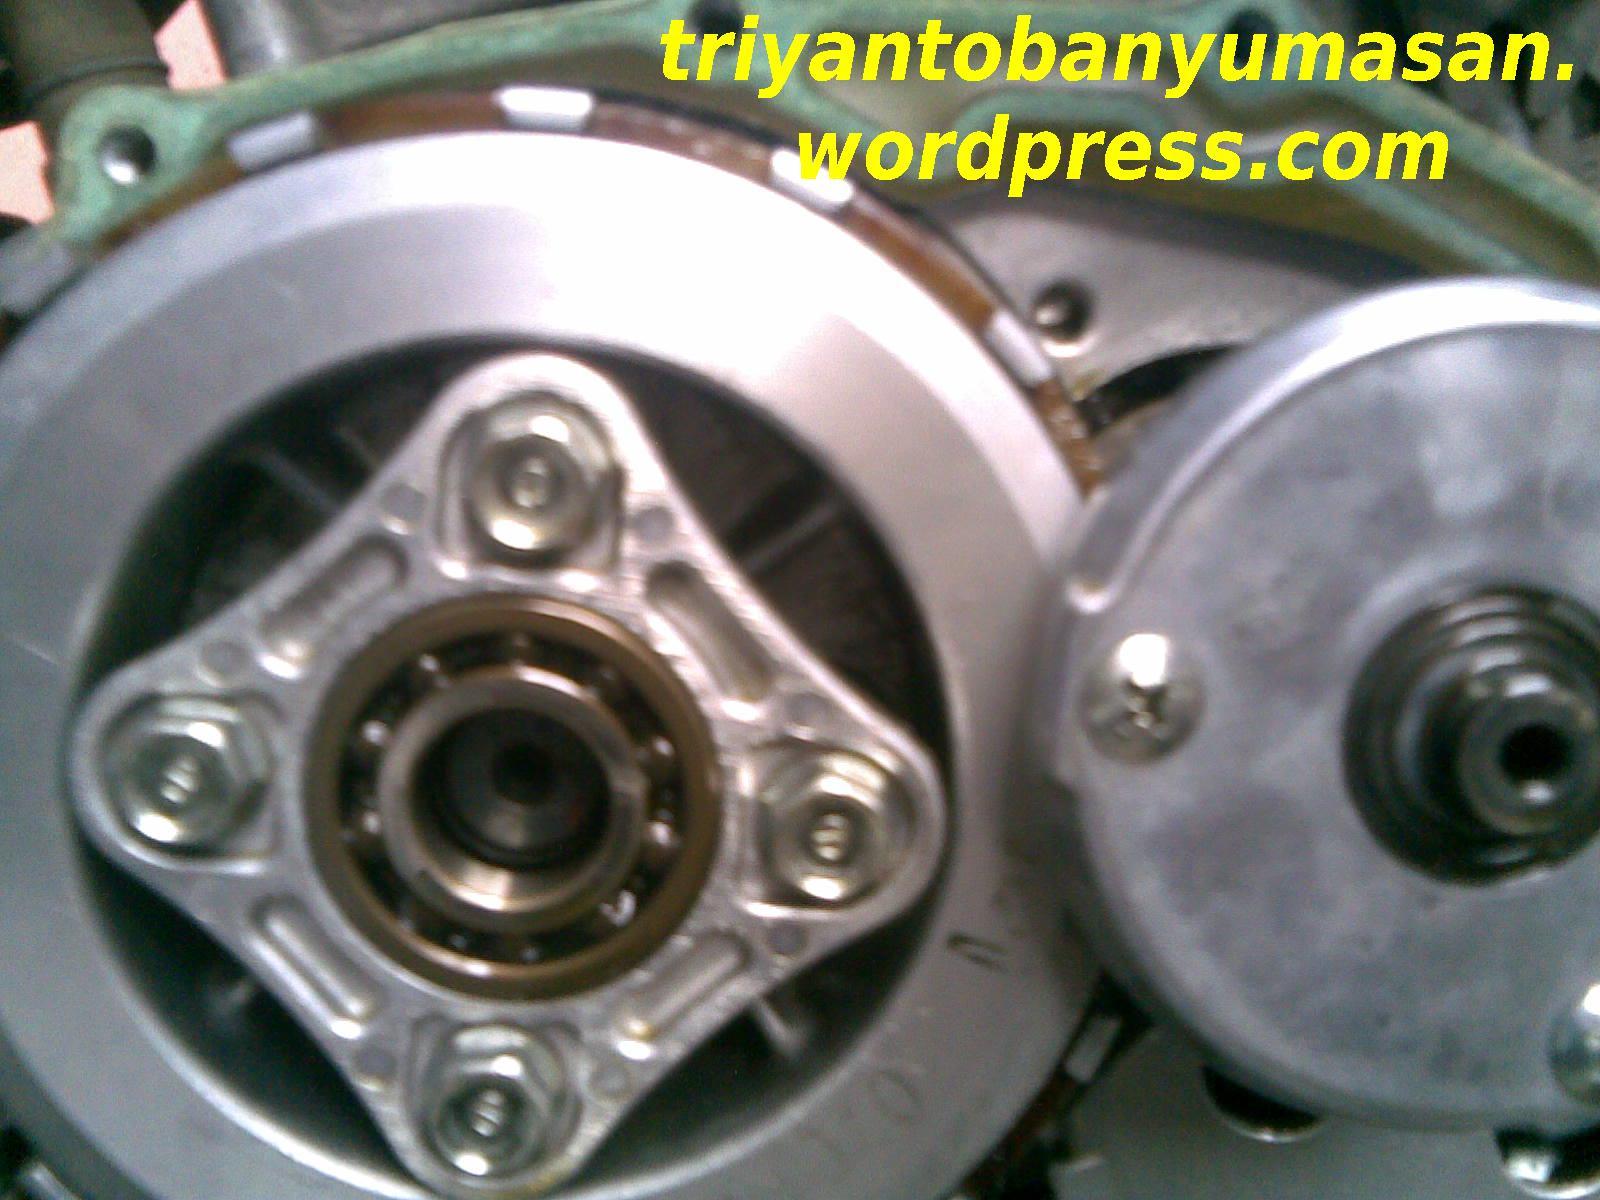 Modif Kampas Kopling Gl Max Combo Modifikasi Plat Besi Tiger Grand Cb Mega Pro Original Honda Ganti Kanvas Dan Per Mongtorku 6 Triyanto